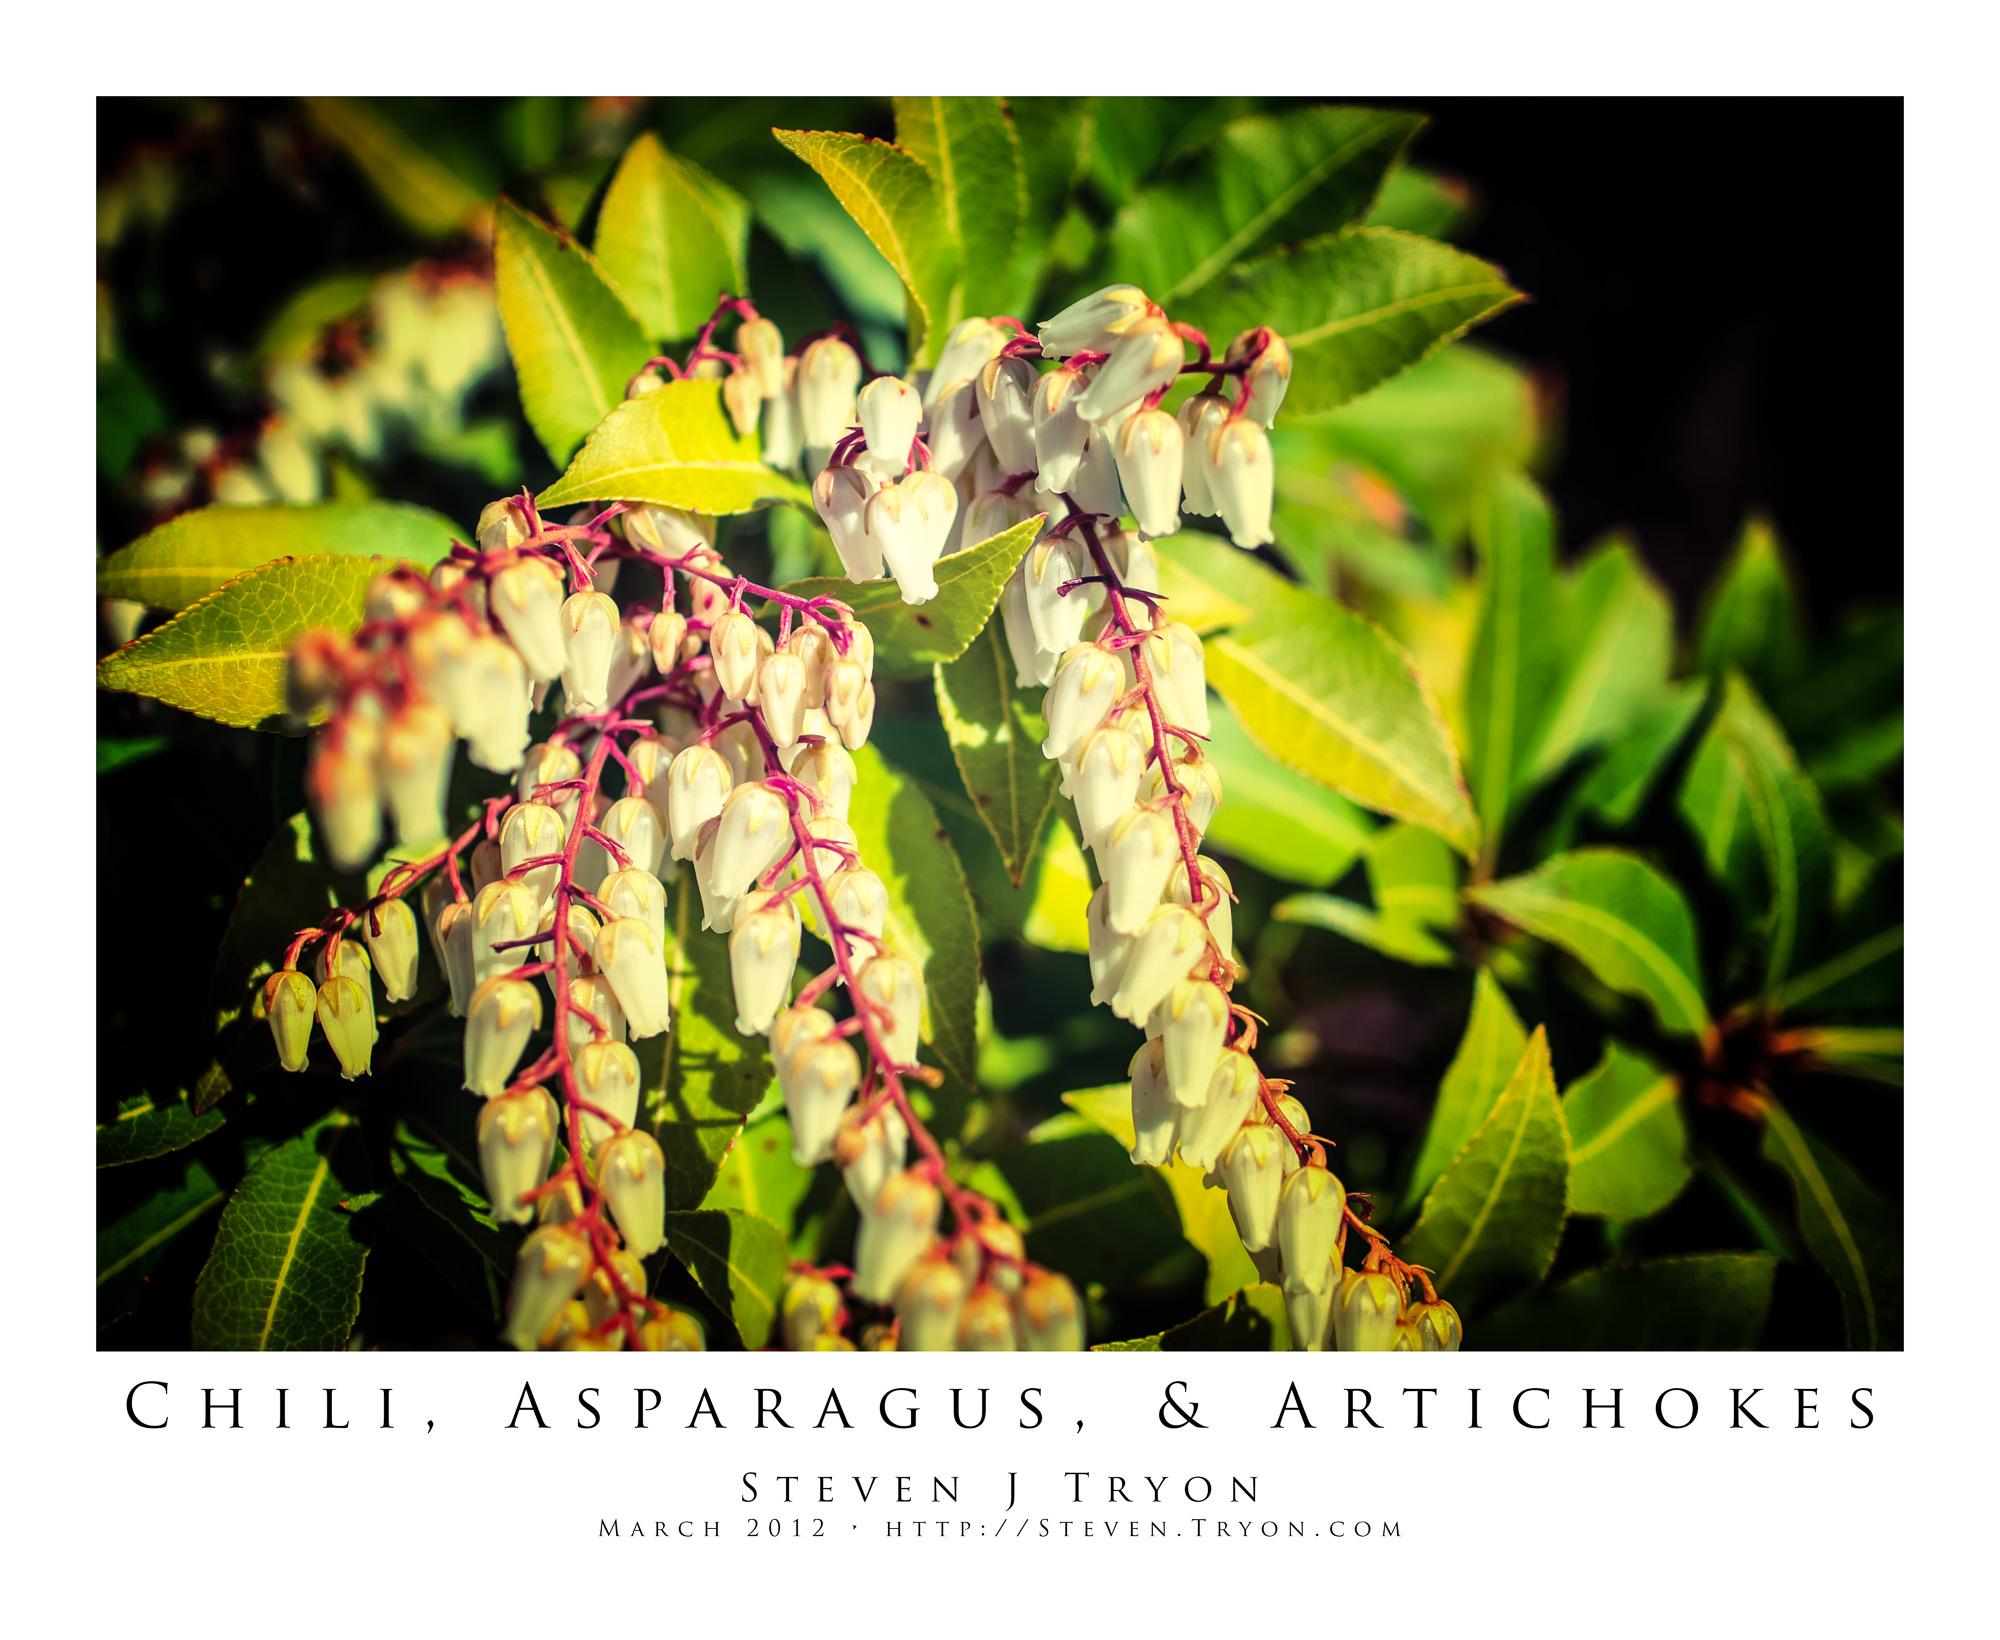 Chili, Asparagus, & Artichokes